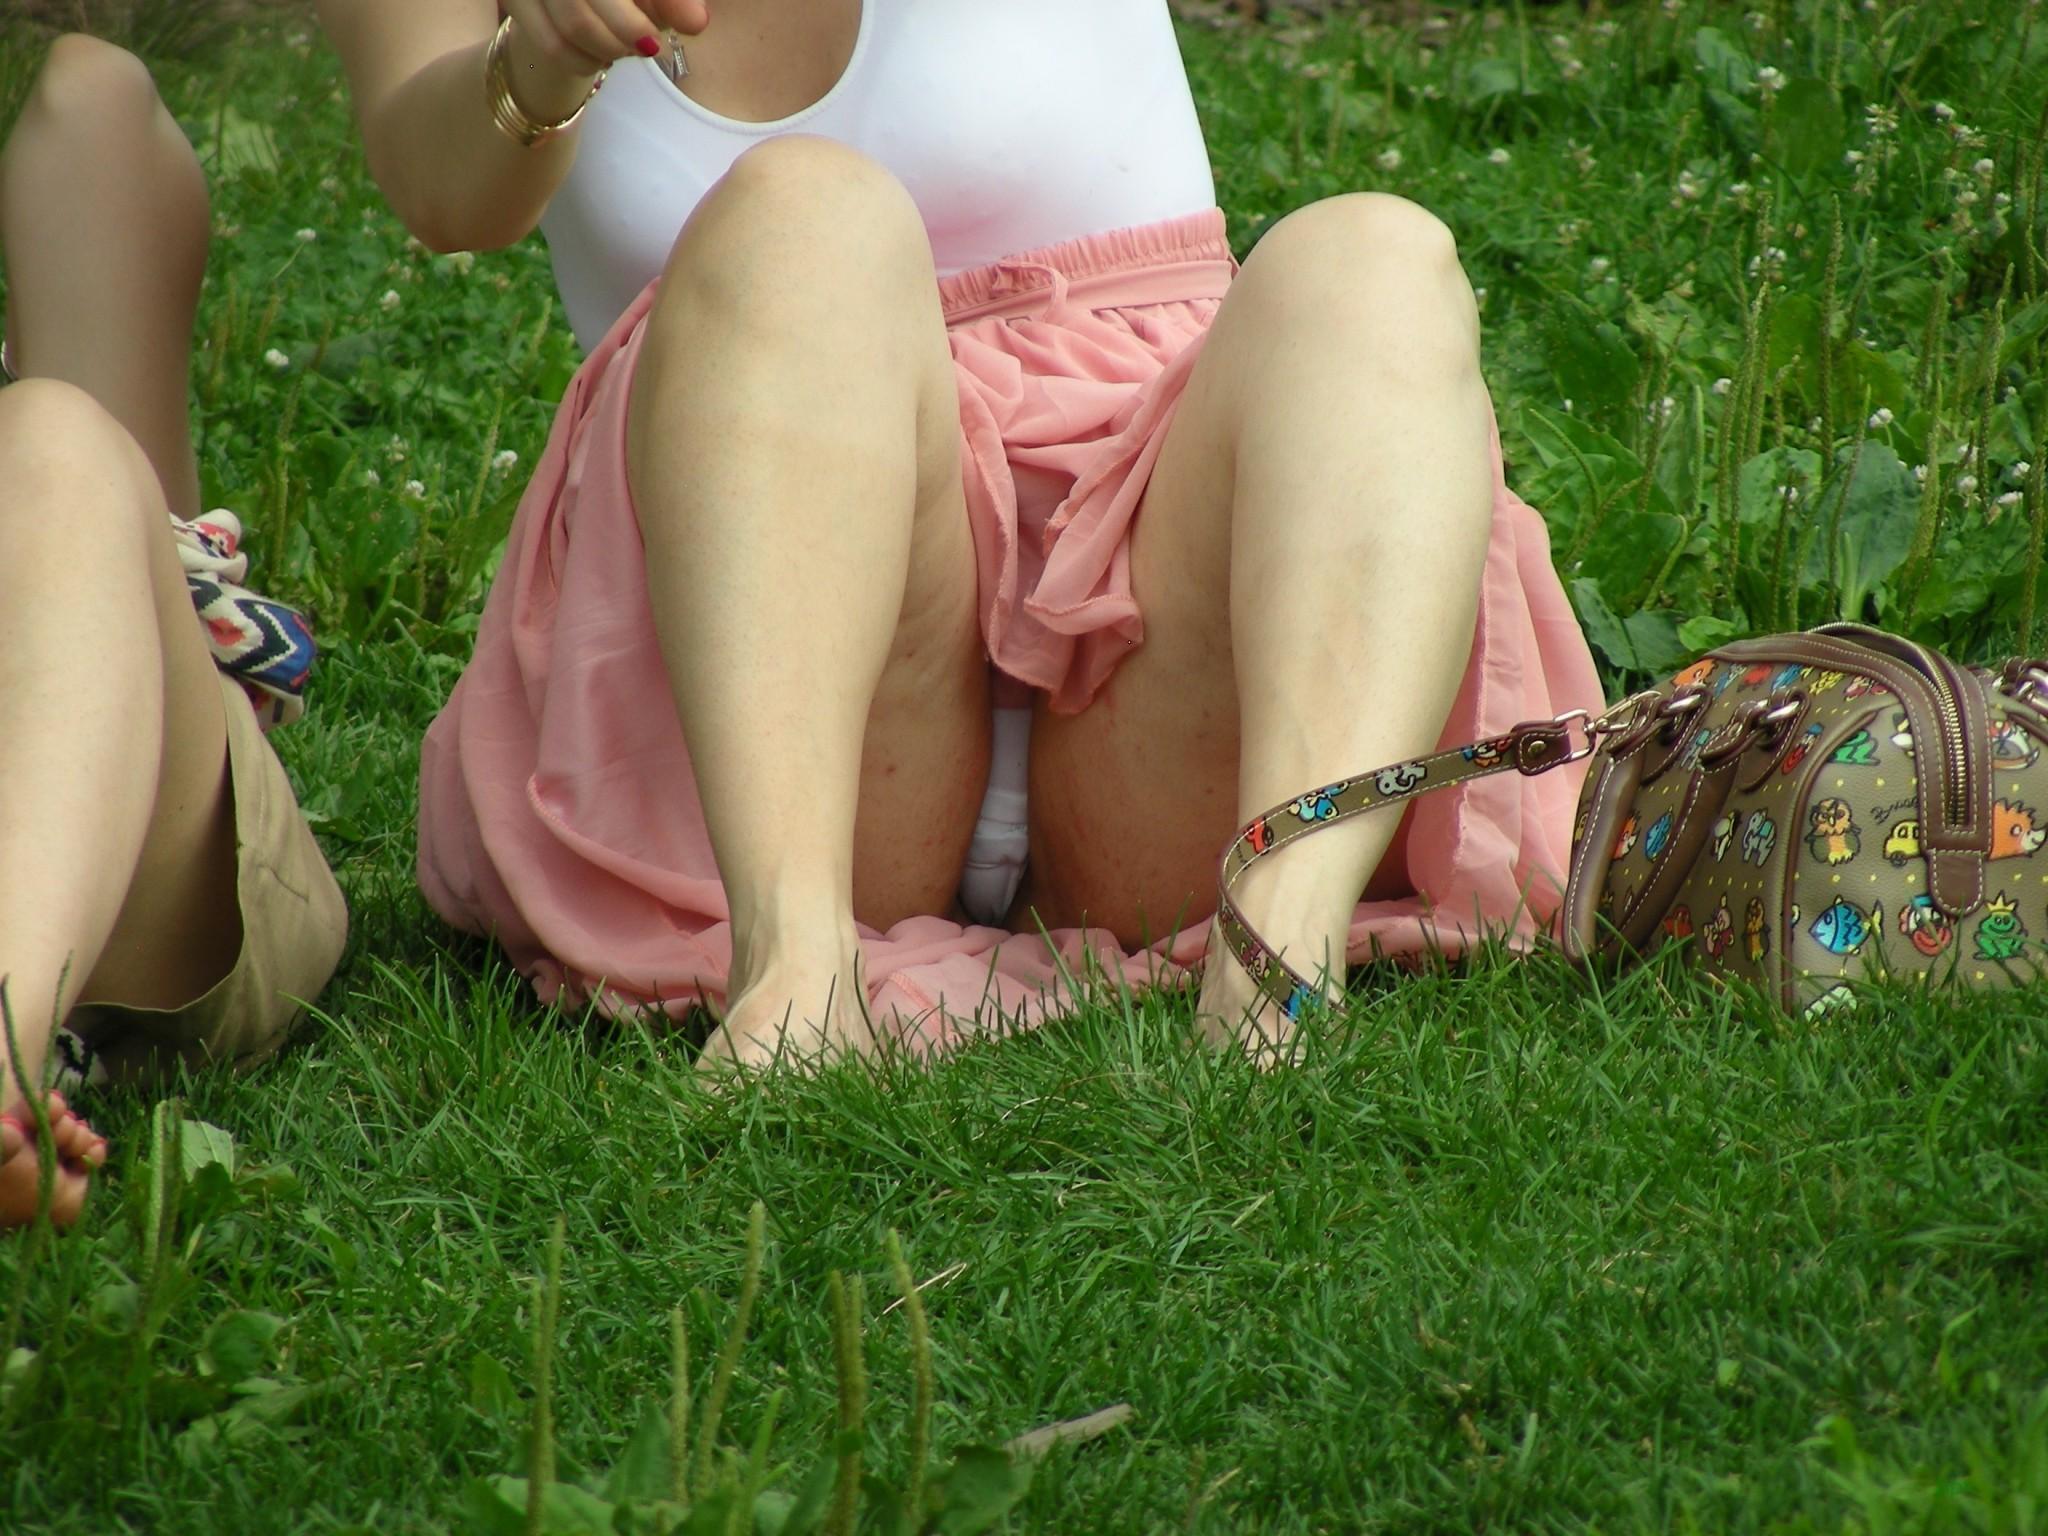 Girls pissing their panties in public